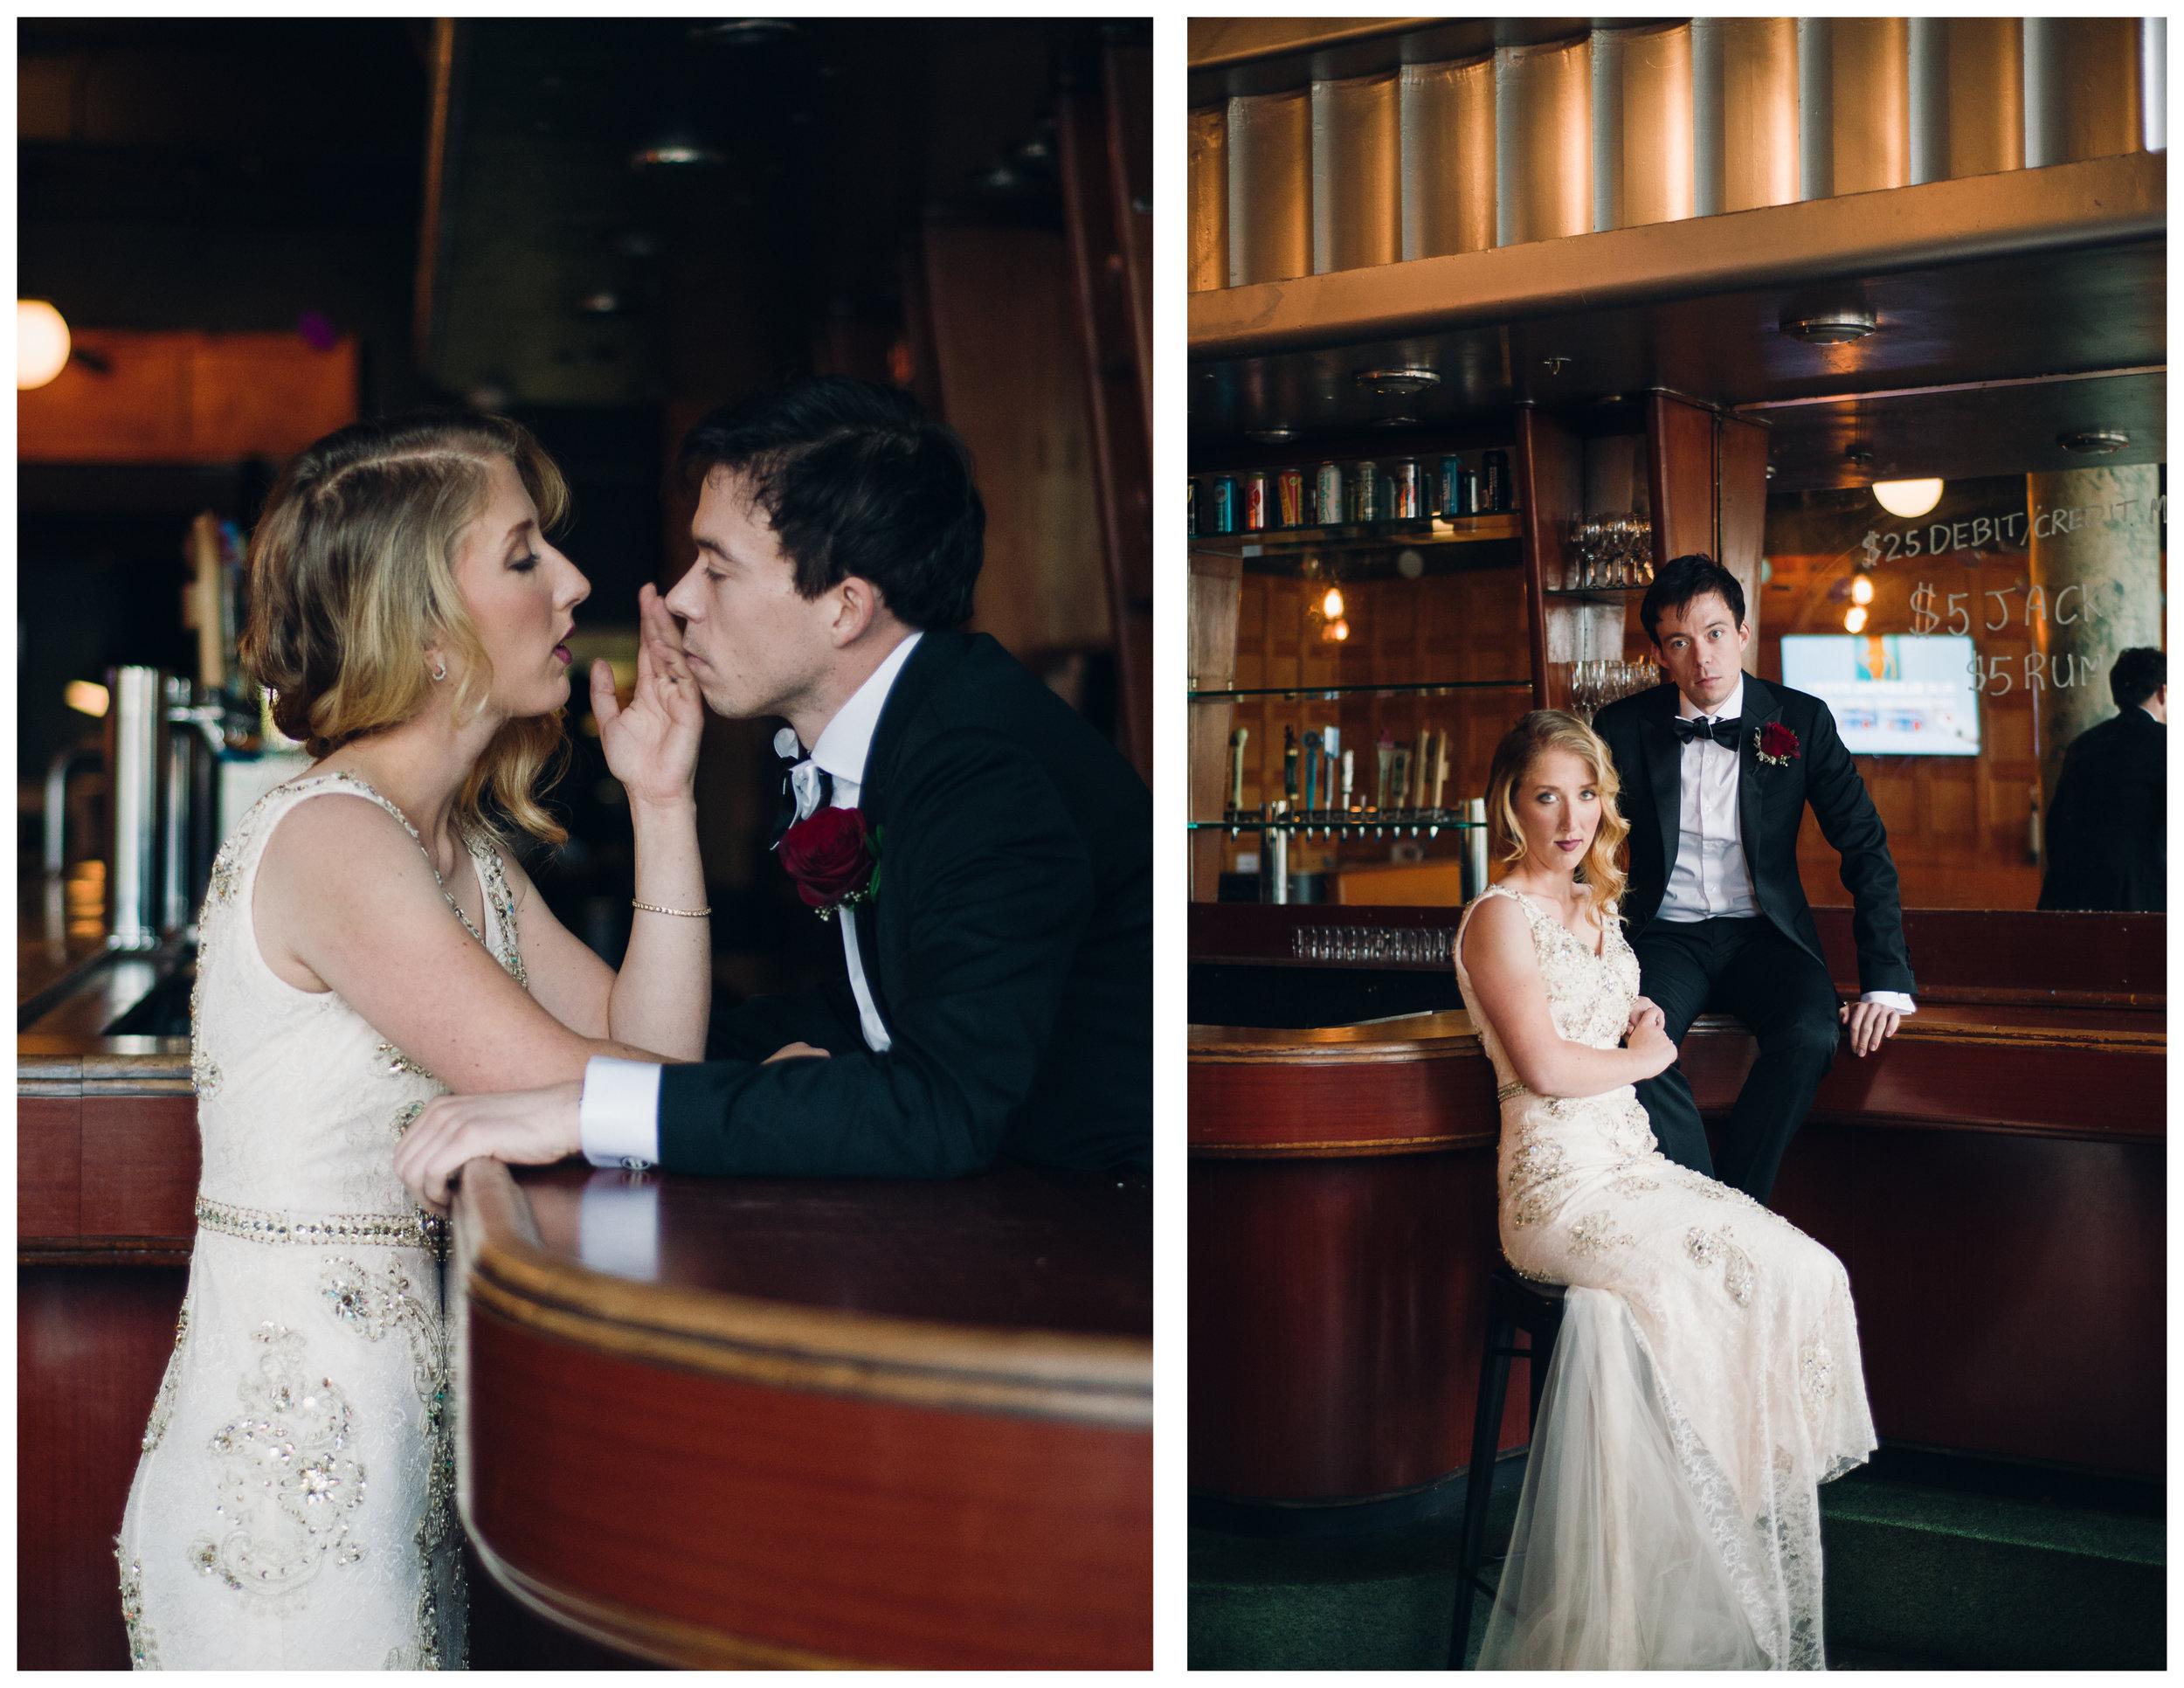 Gladstone Great Gastby Wedding 2x2_12.jpg